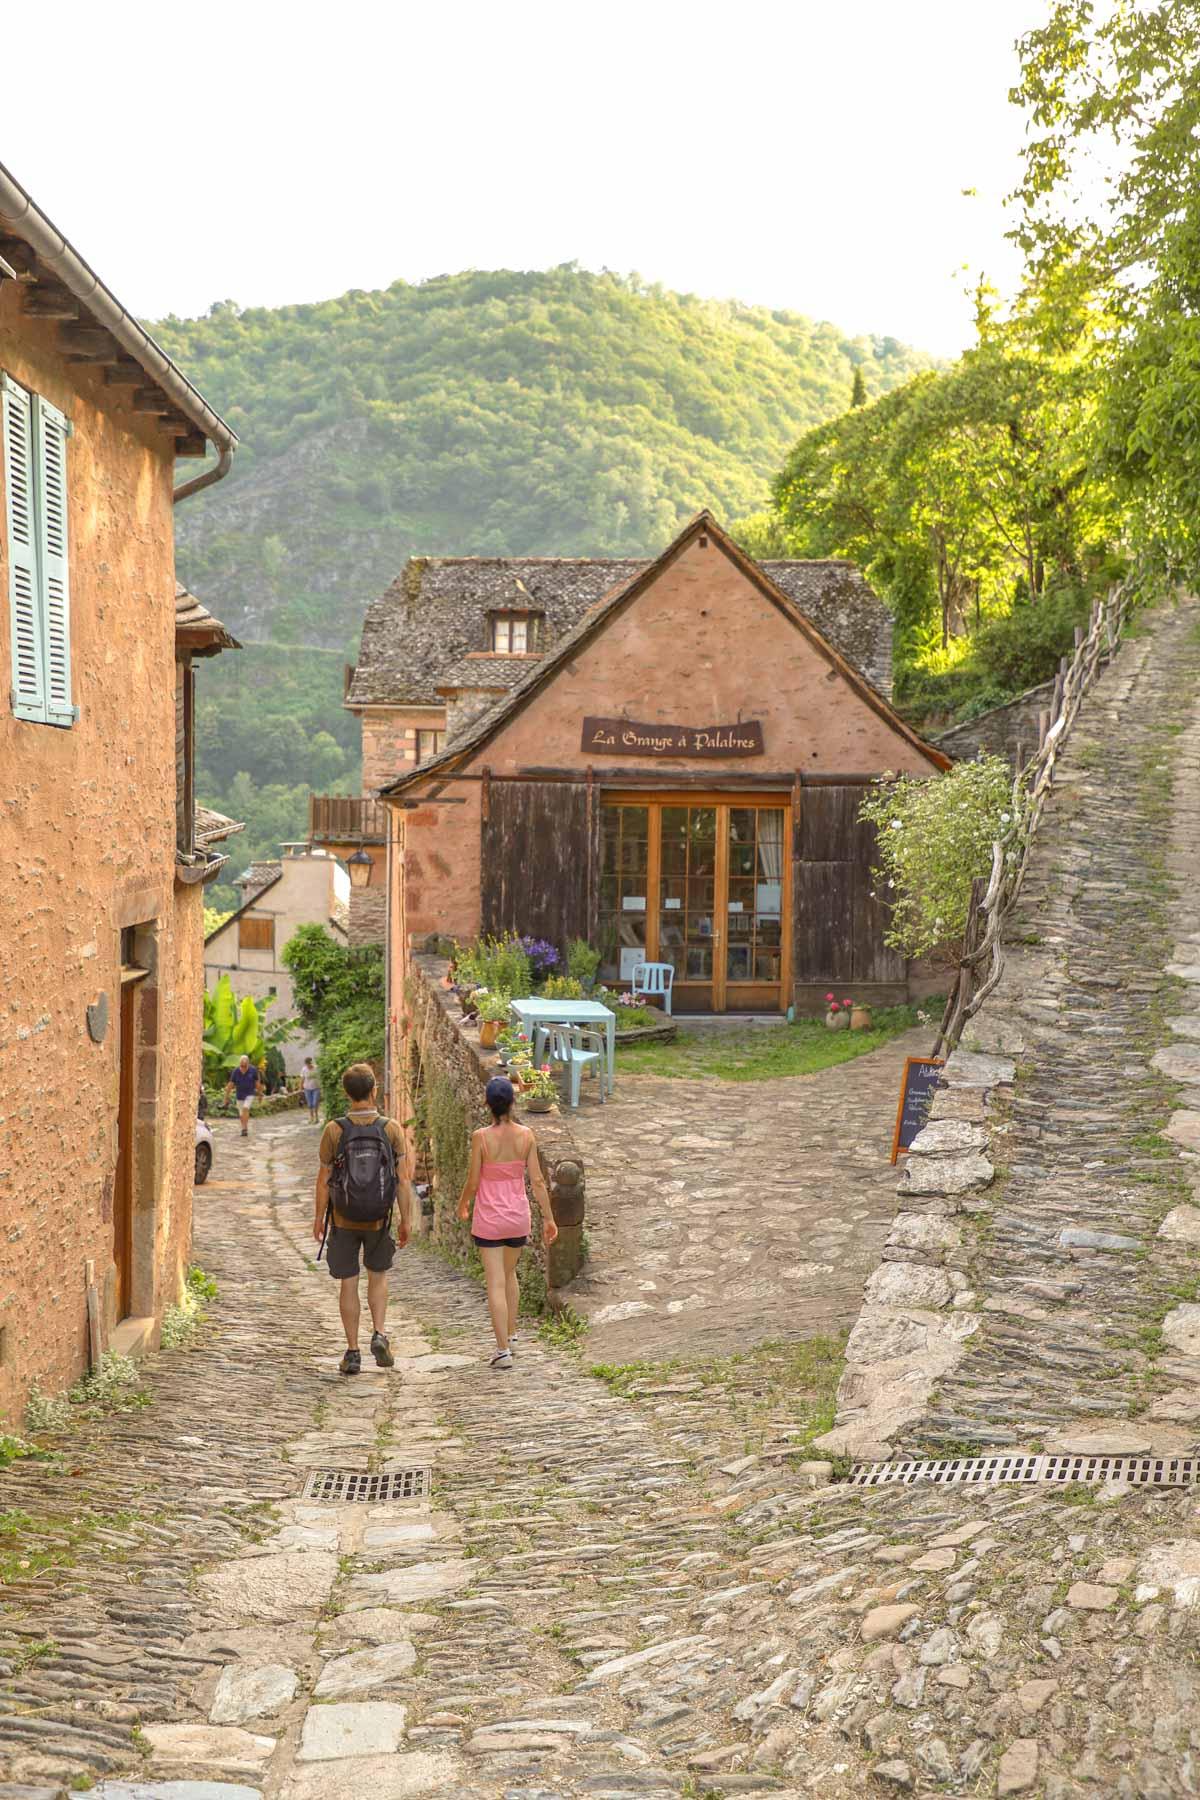 Ruelle-du-village-en-aveyron